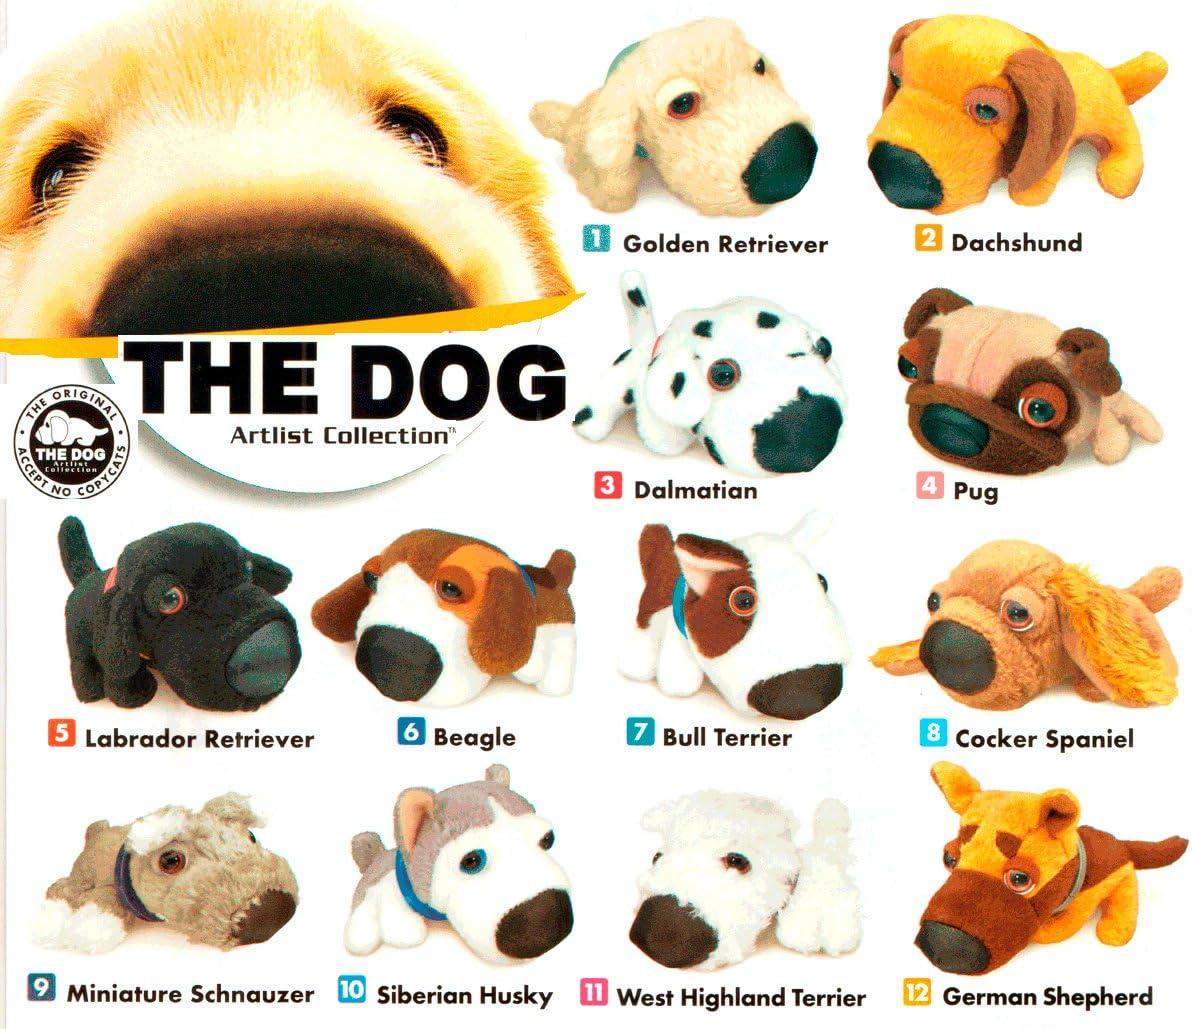 Set Of Dog Stuffed Animals, Amazon Com Mcdonalds Artlist Collection The Dog Complete Set Of 12 Plush Animals Everything Else